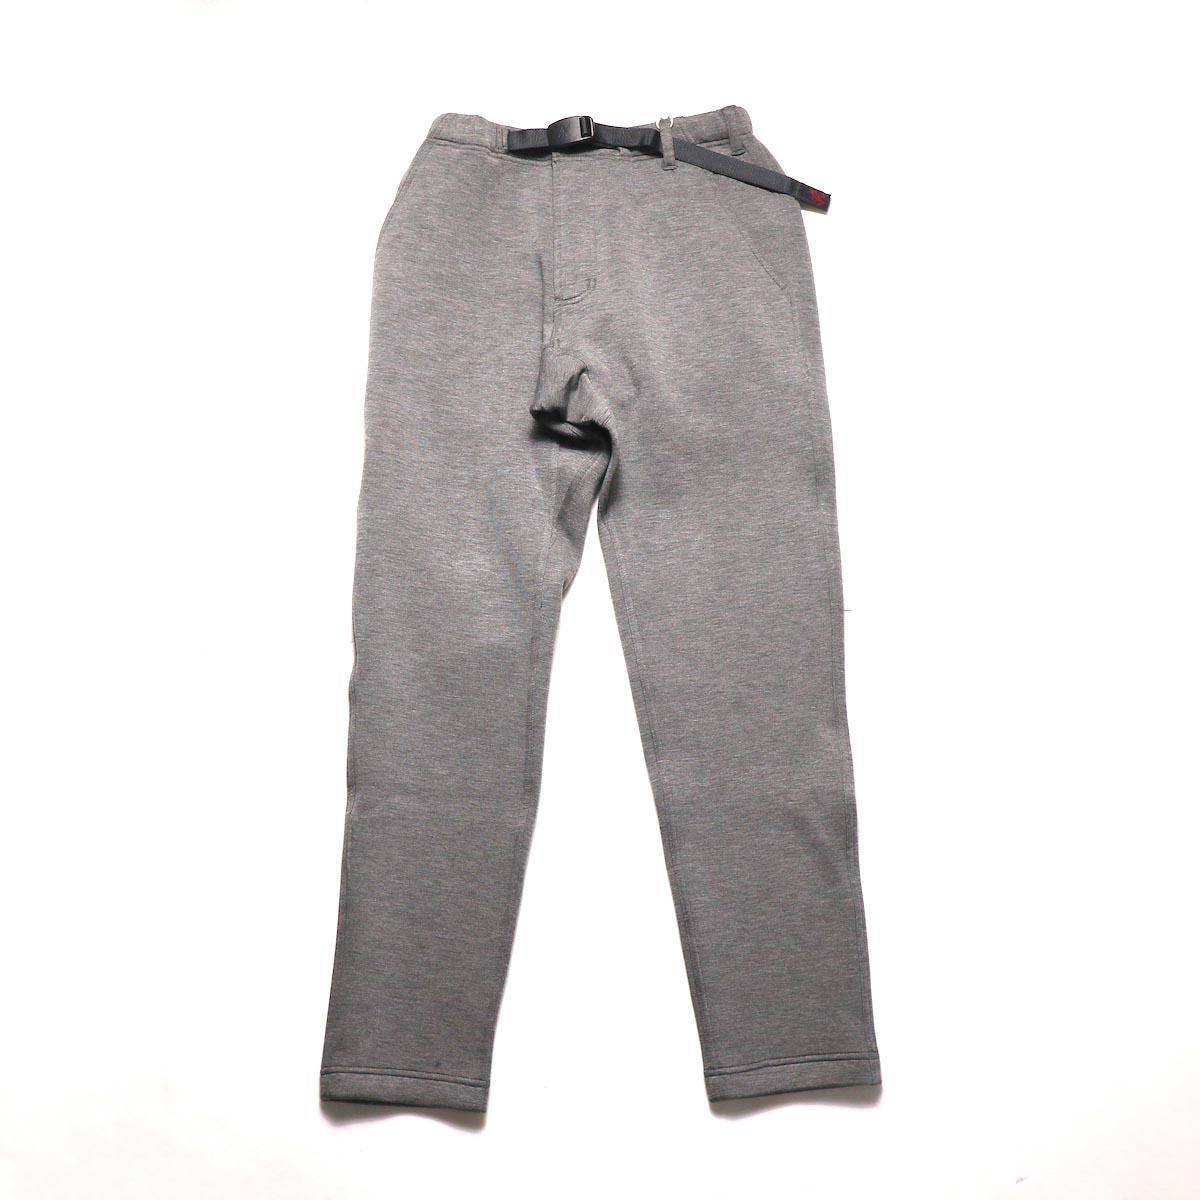 GRAMICCI / TECK KNIT SLIM FIT PANTS (Heather Charcoal)